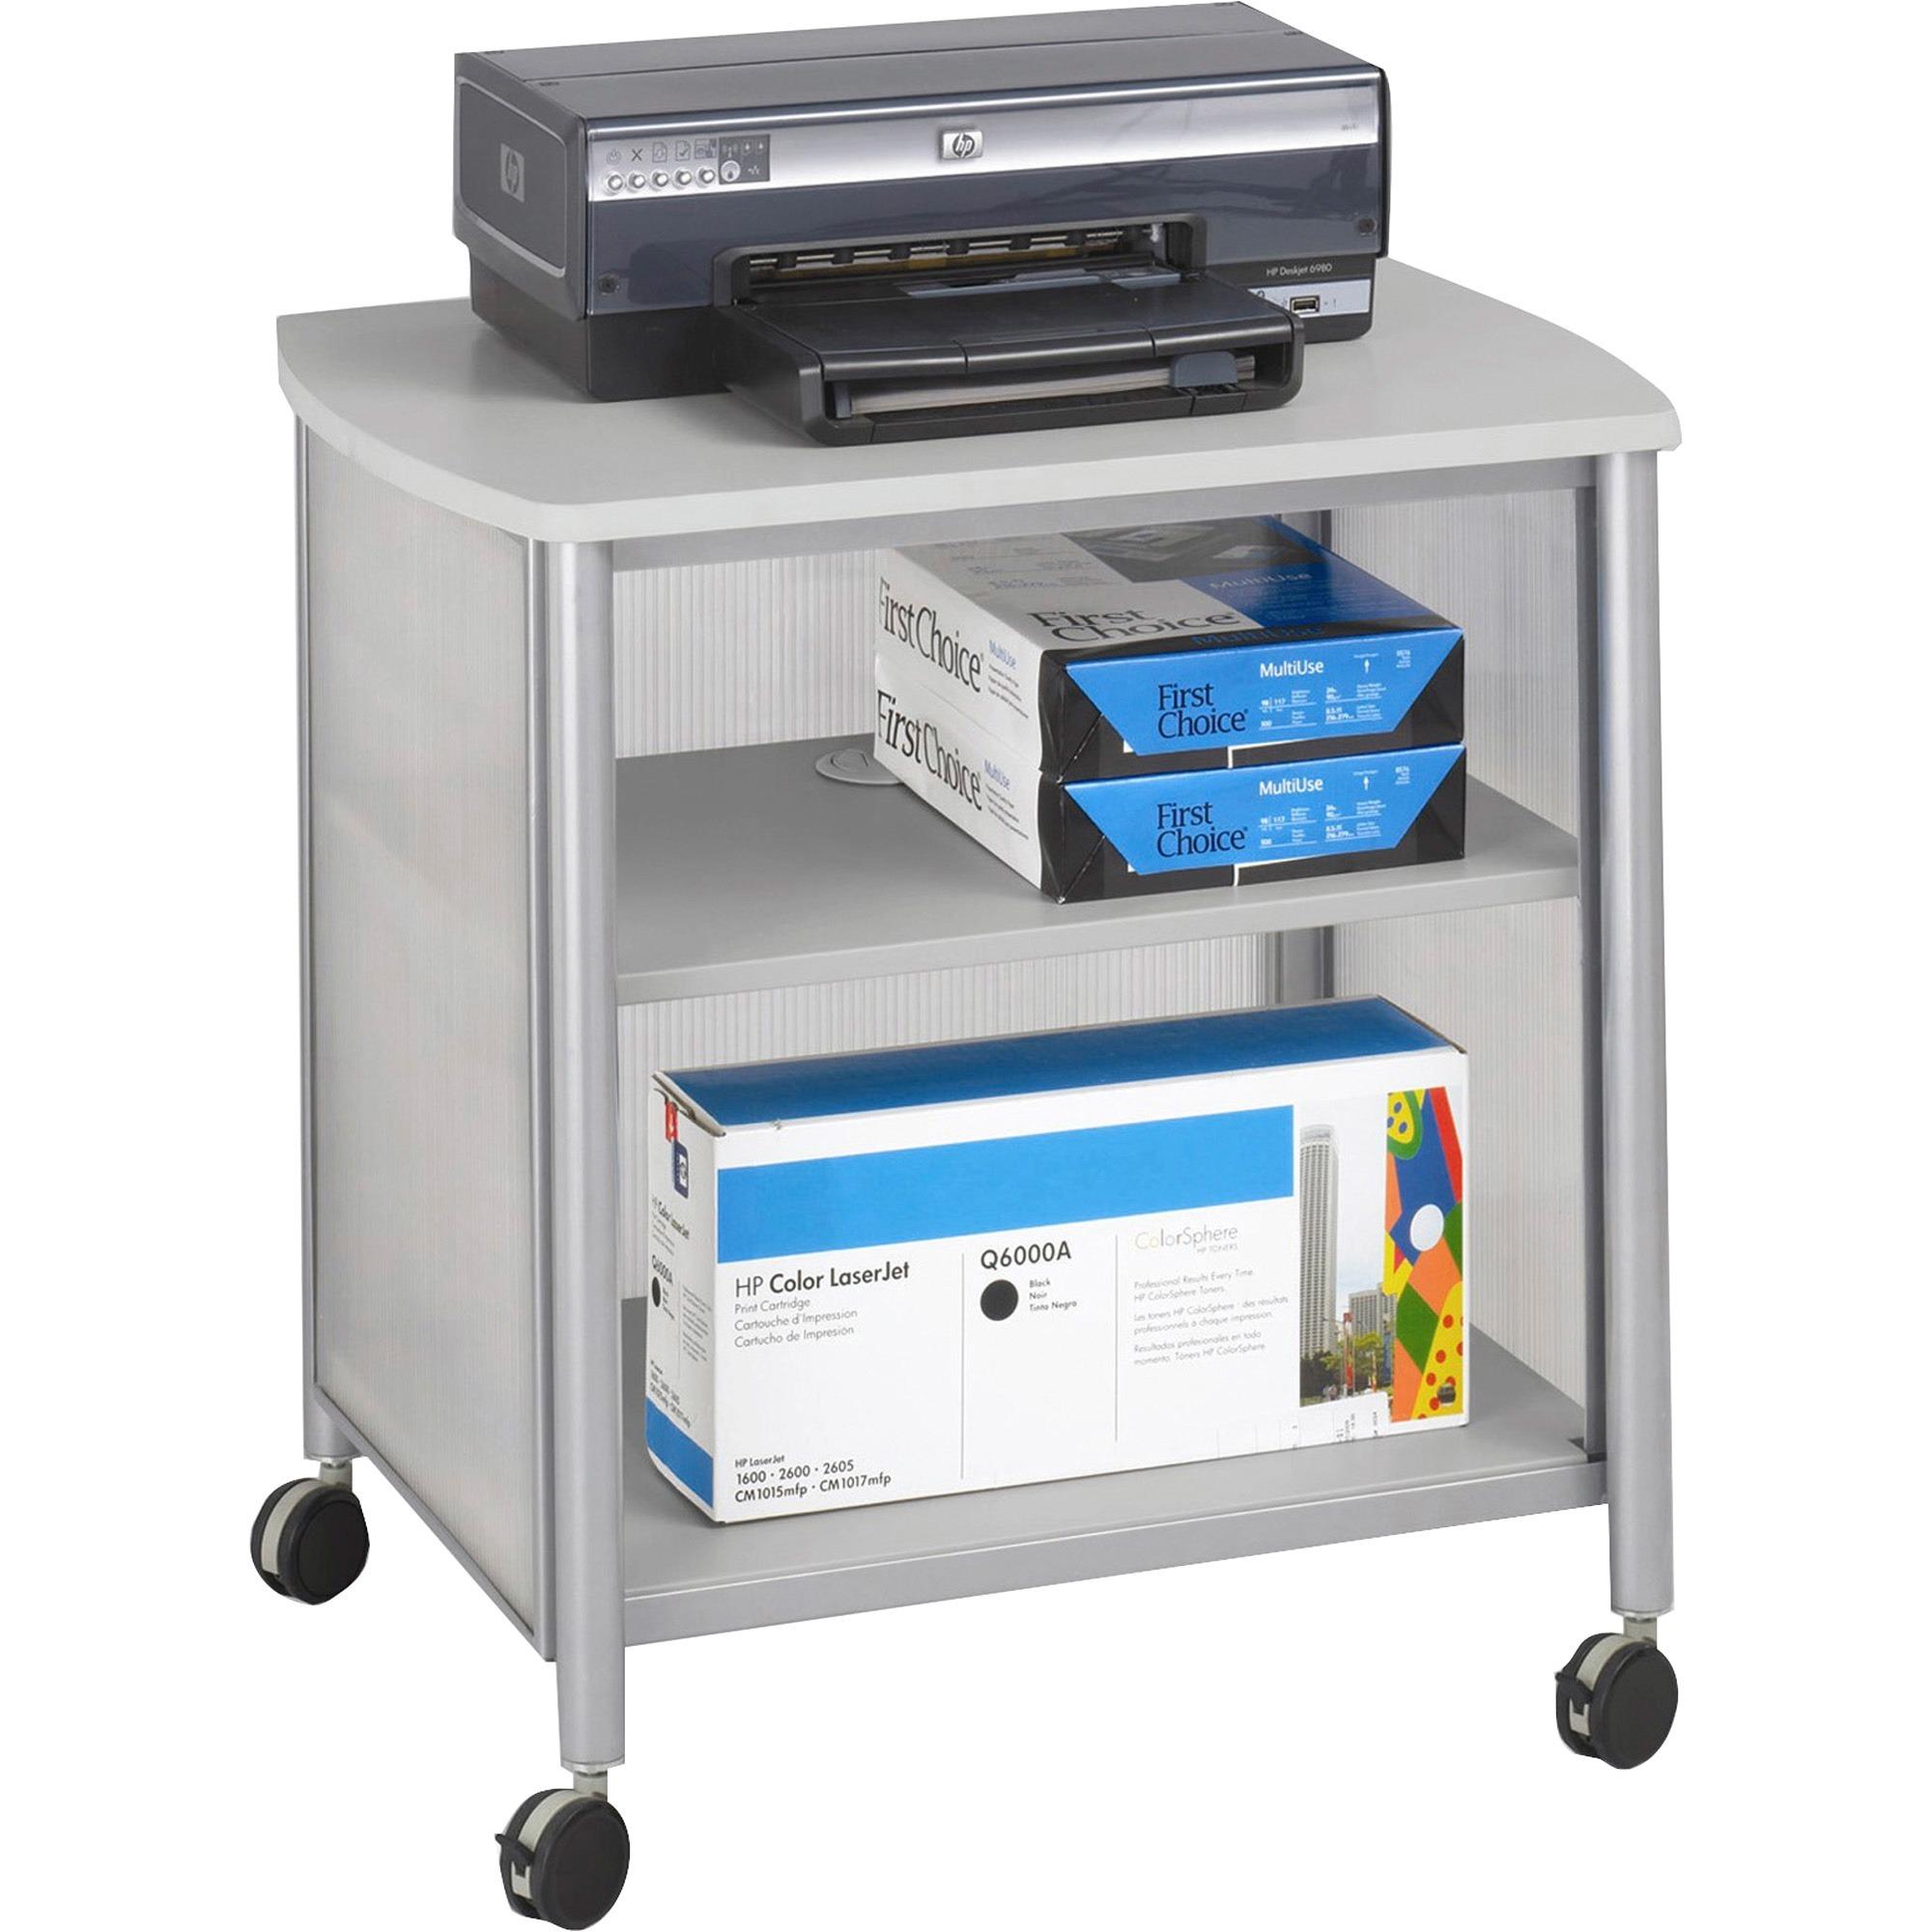 Safco, SAF1857GR, Impromptu Machine Stand, 1 / Each, Gray